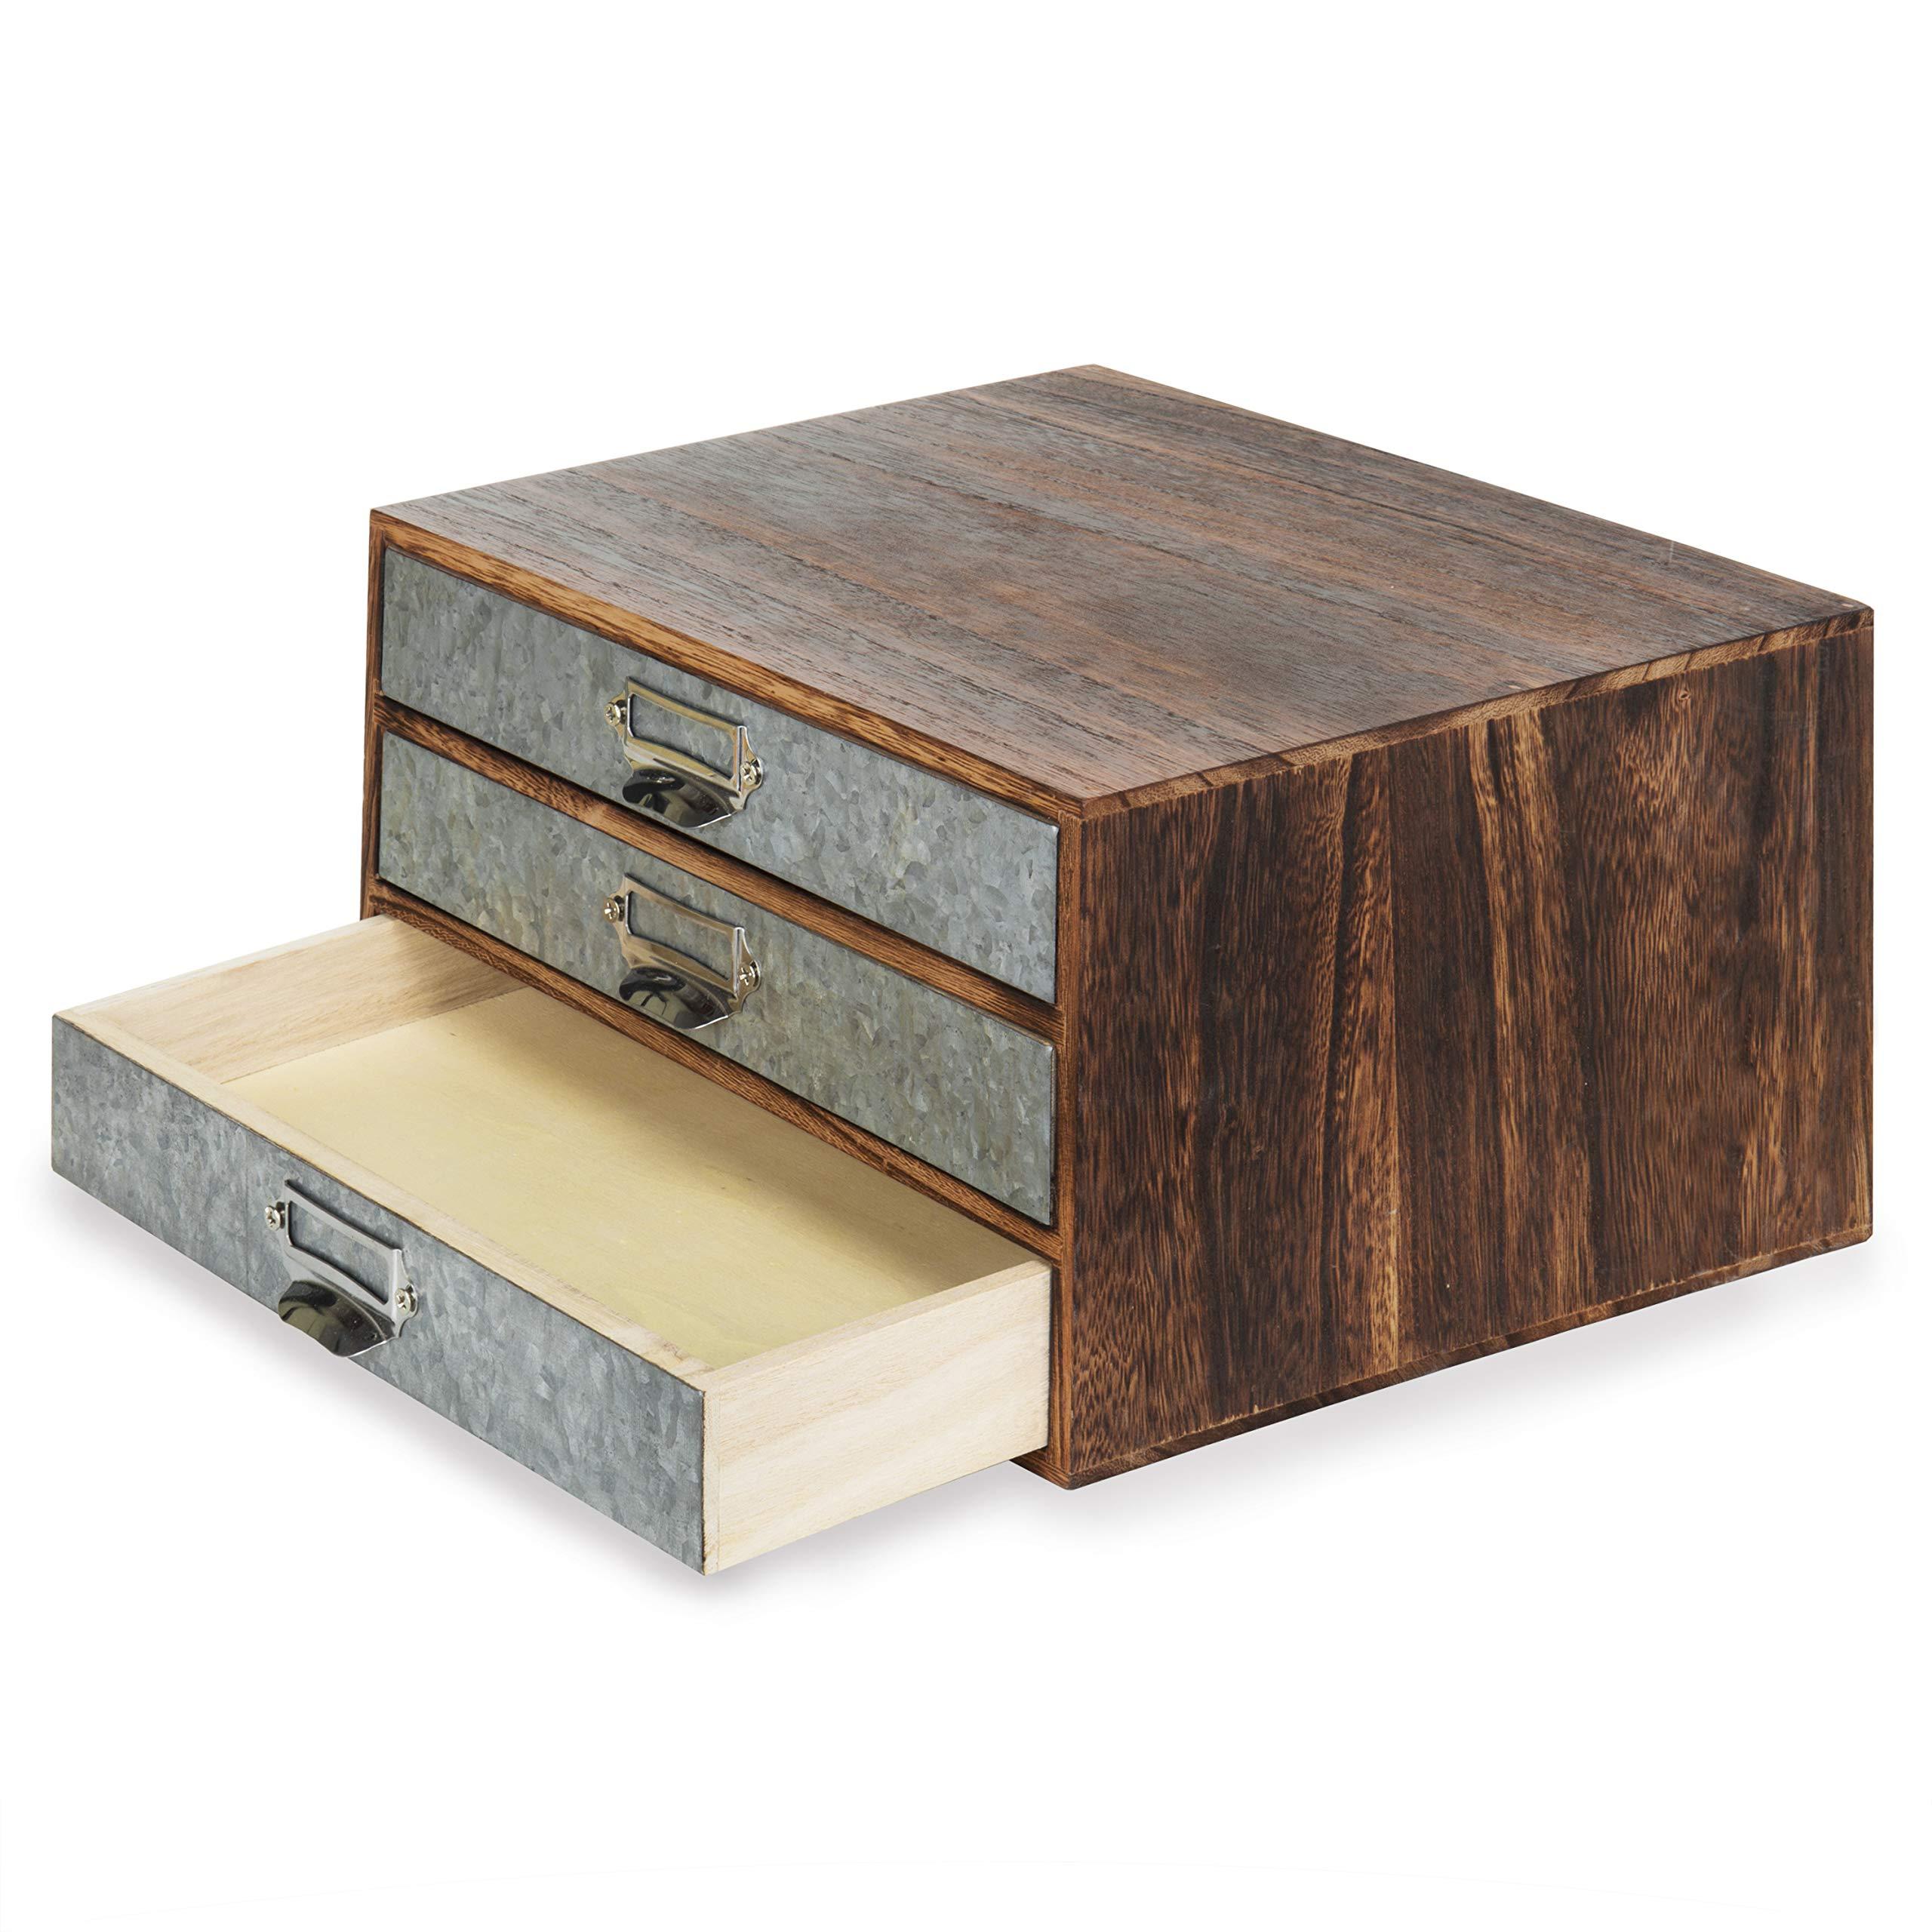 MyGift Rustic Wood & Galvanized Metal 3-Drawer Document Organizer by MyGift